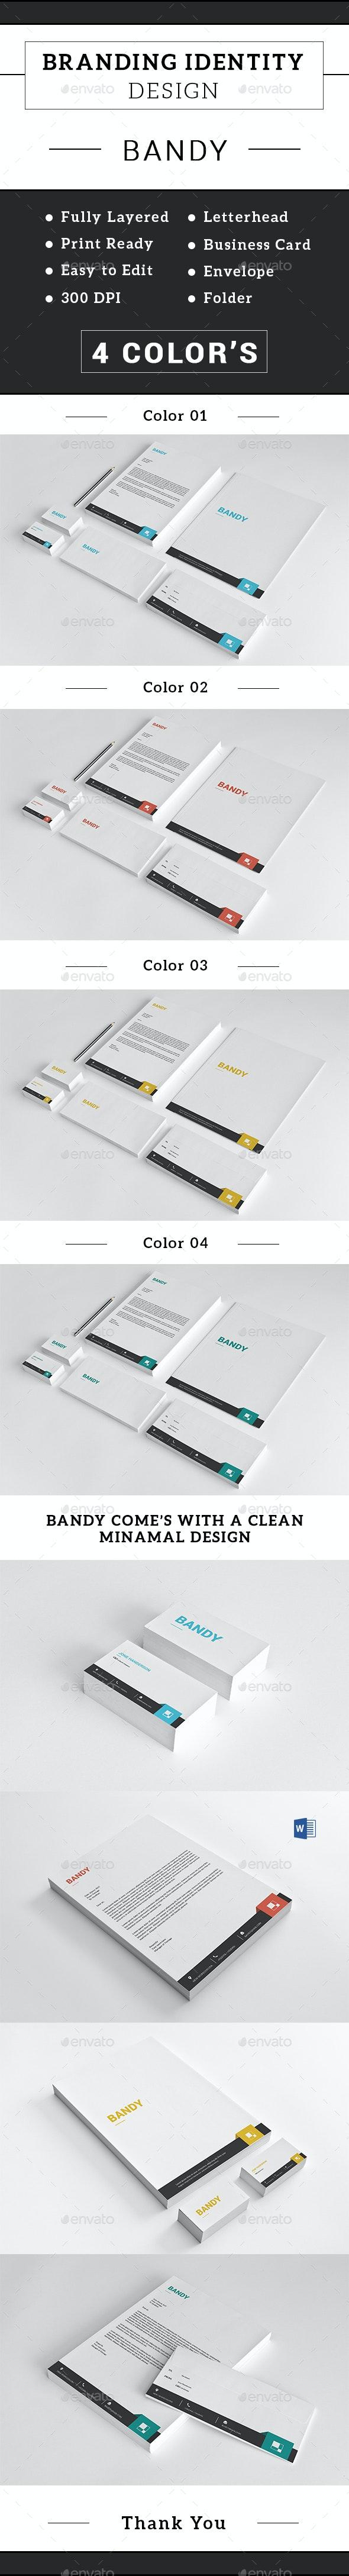 Corporate Stationery Set-v01 - Stationery Print Templates